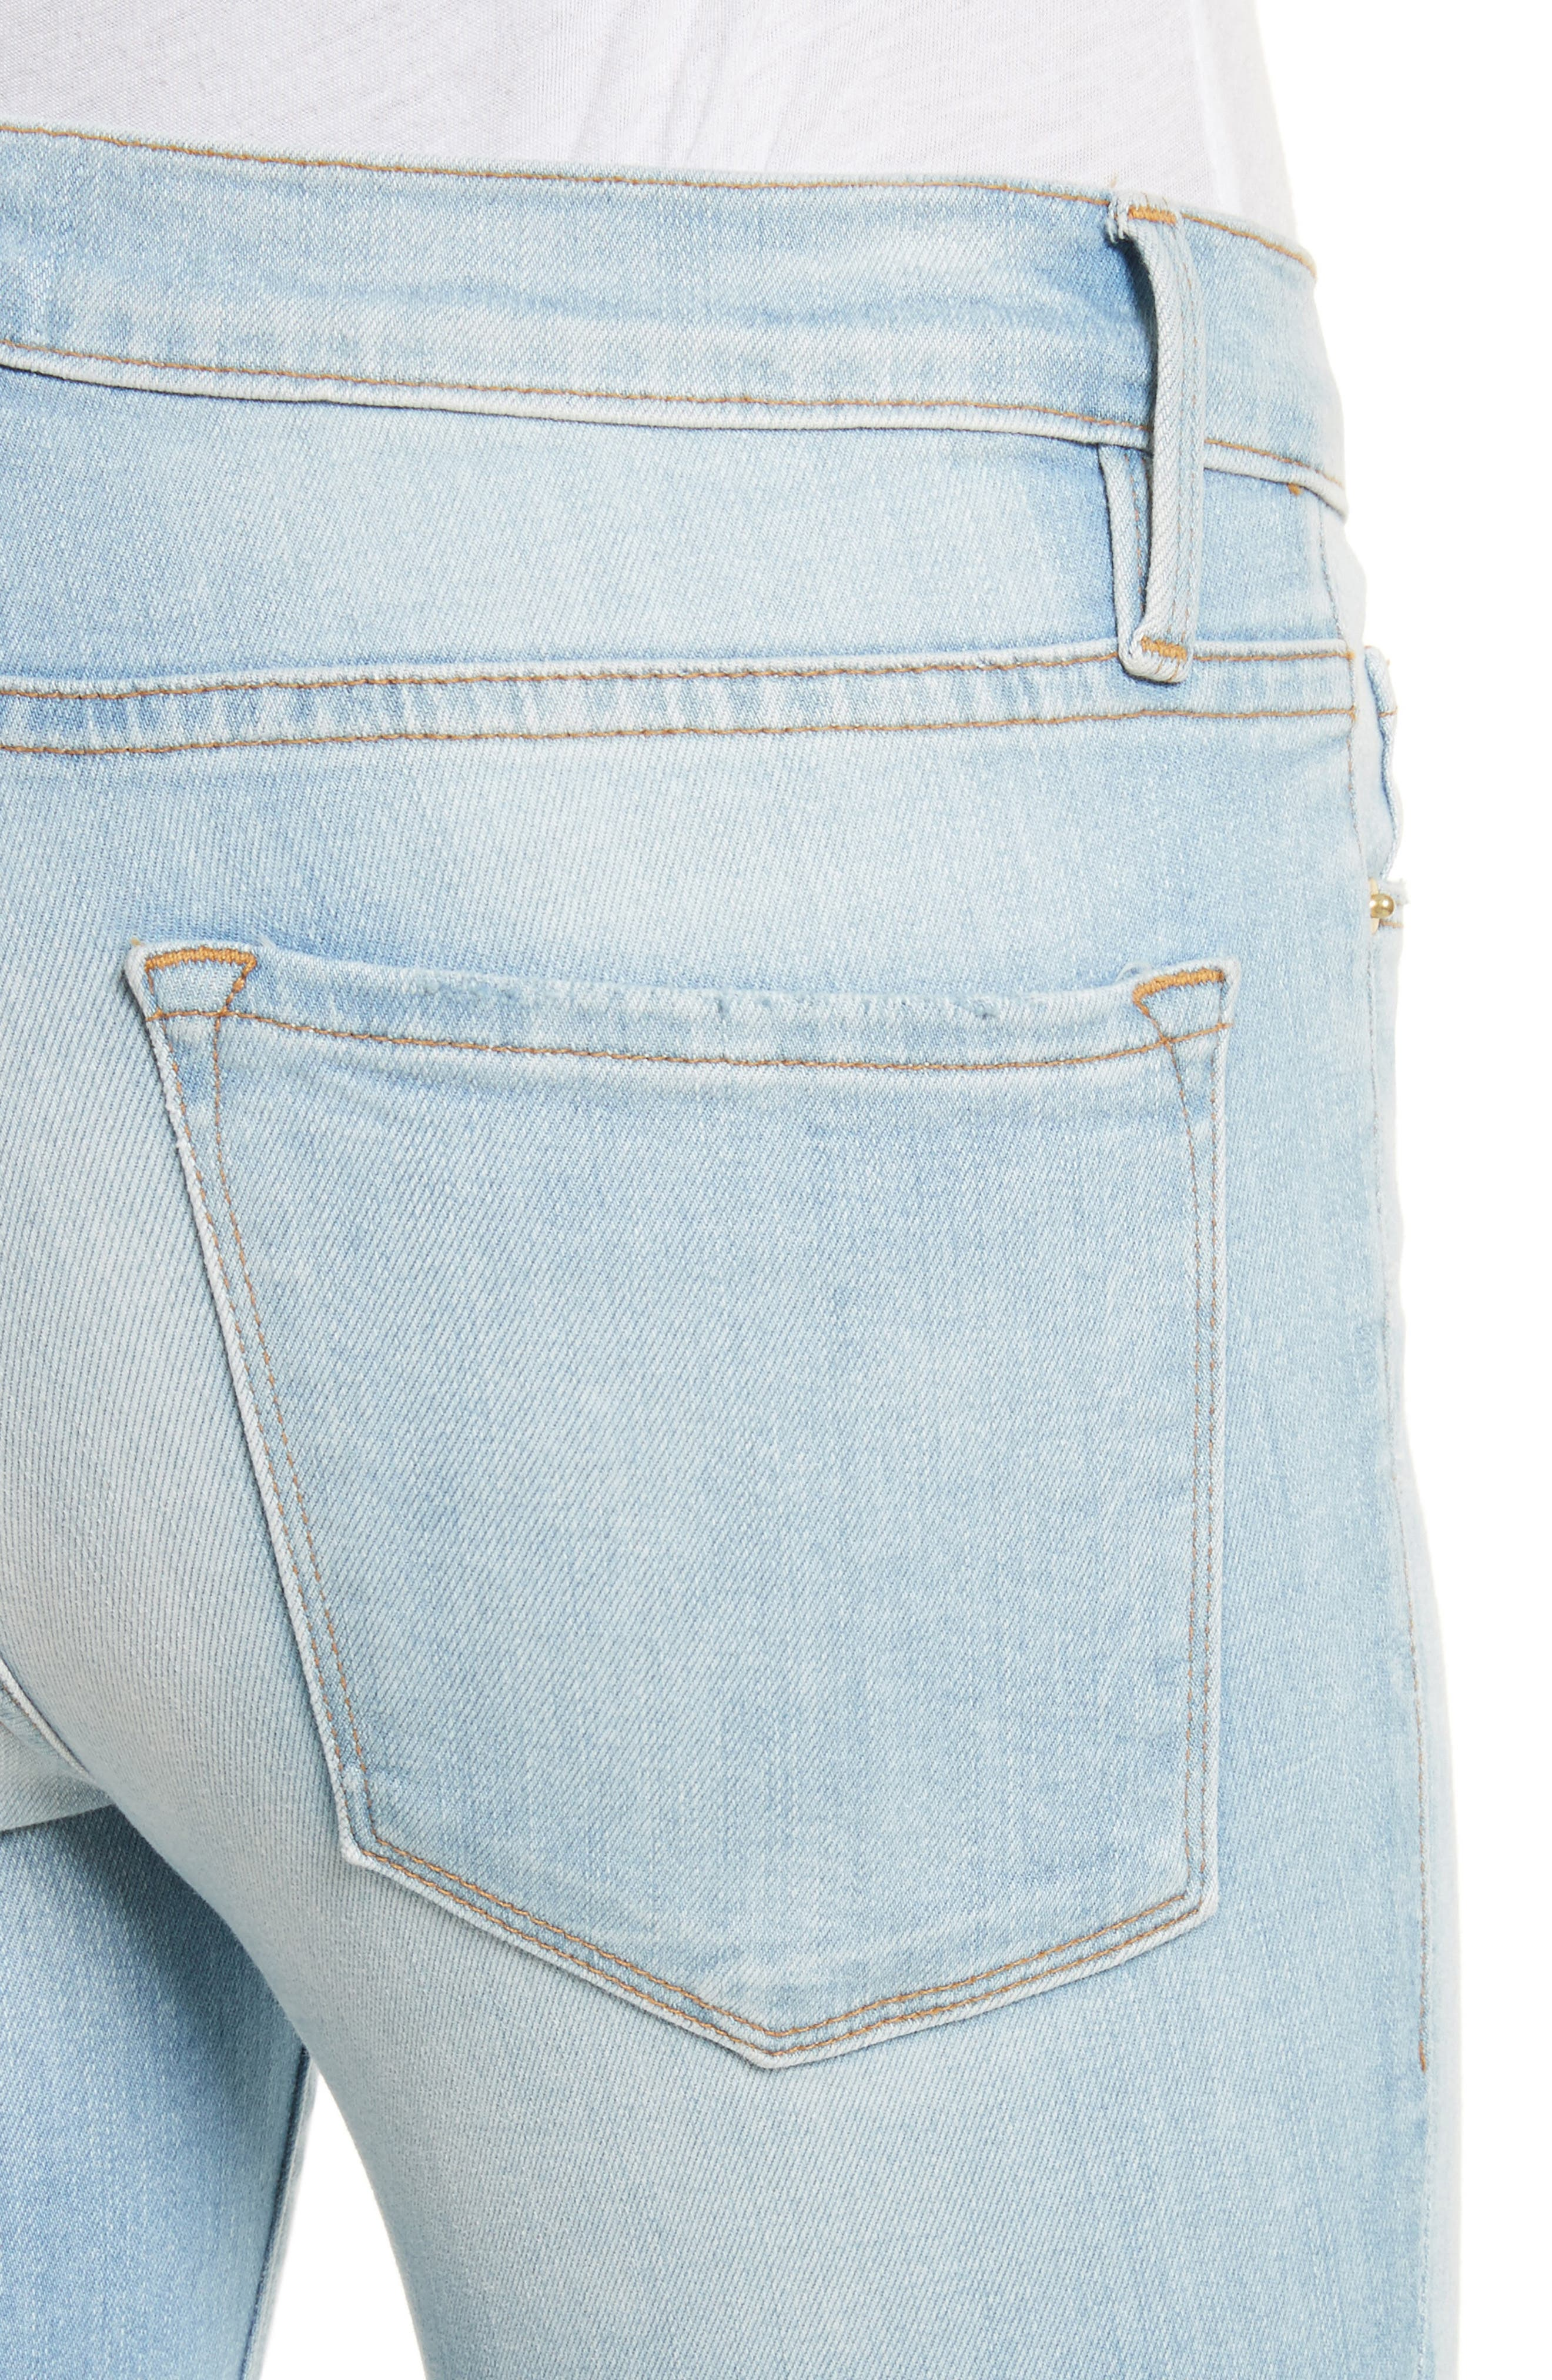 Le Skinny de Jeanne Raw Edge Skinny Jeans,                             Alternate thumbnail 4, color,                             450